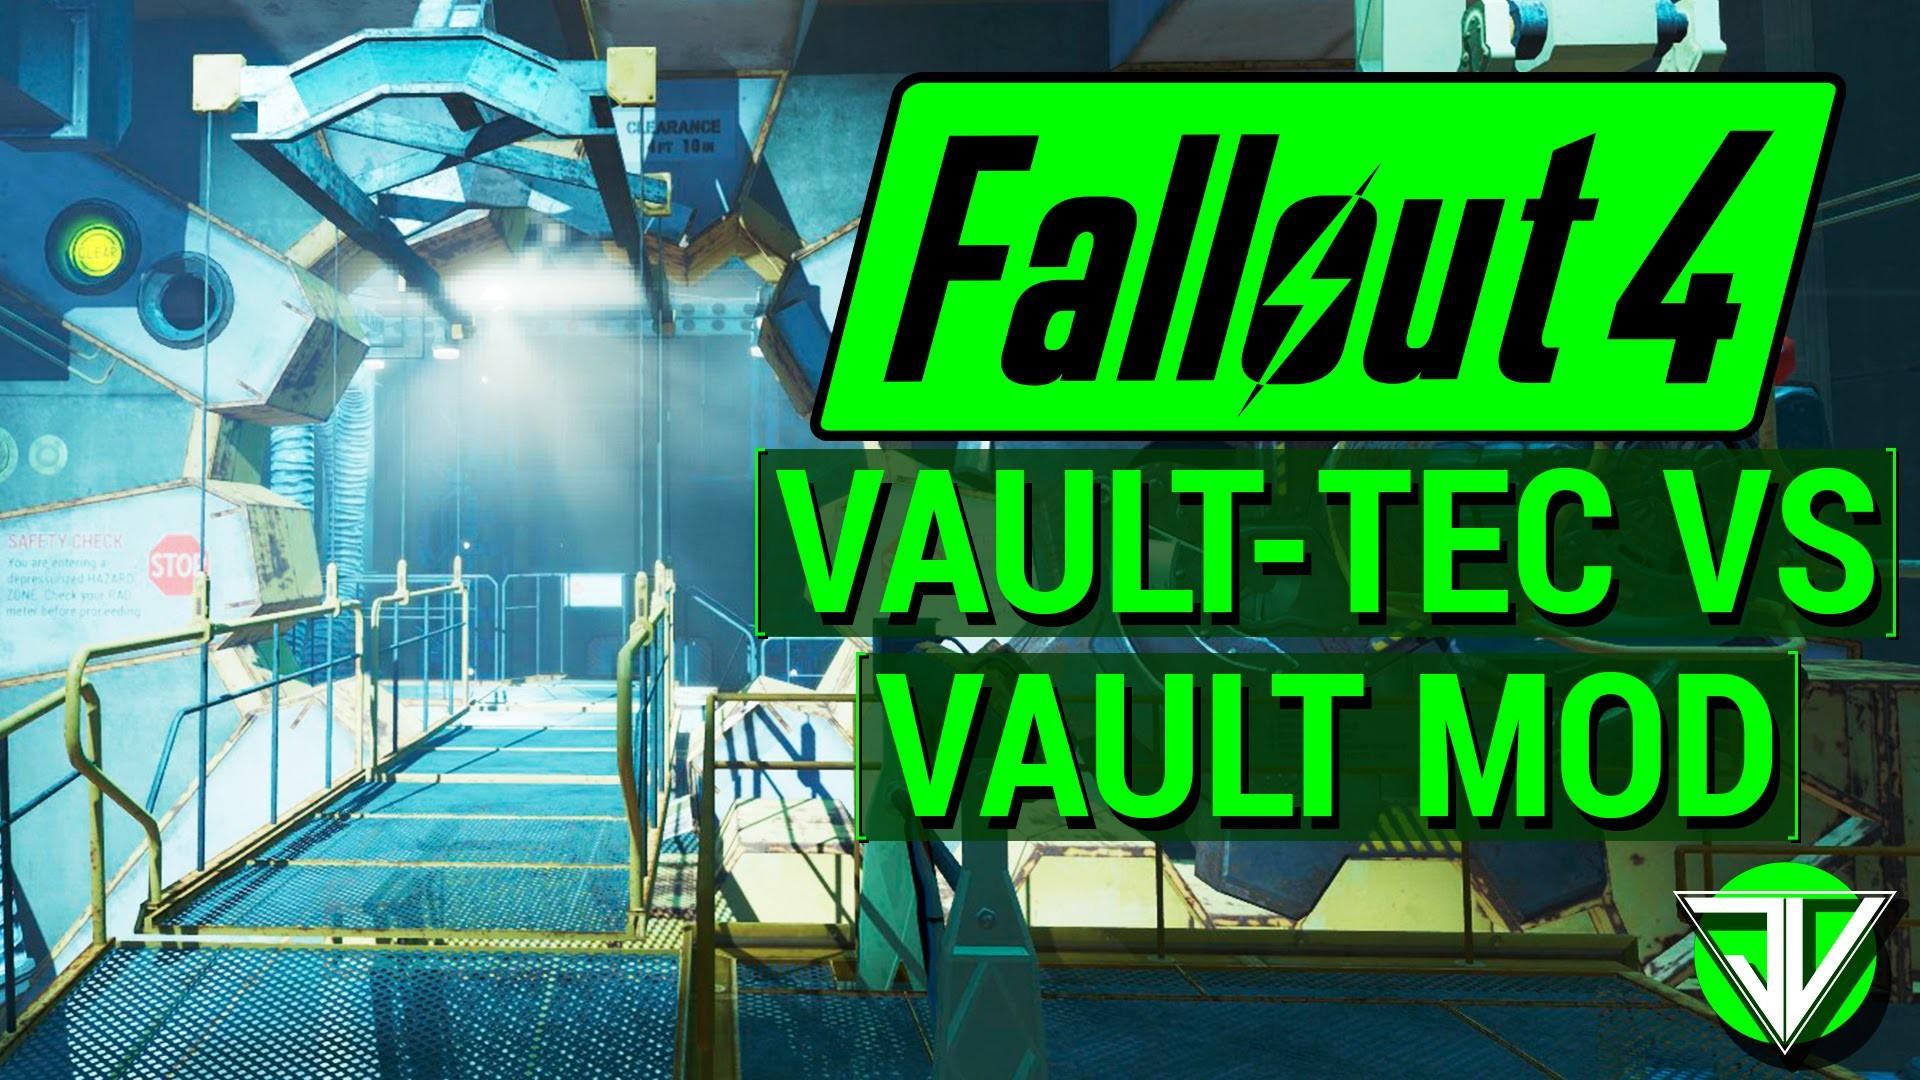 FALLOUT 4: Vault-Tec DLC vs. Vault Building Mod! (Comparing Workshop DLC  and Build Your Own Vault!) – YouTube